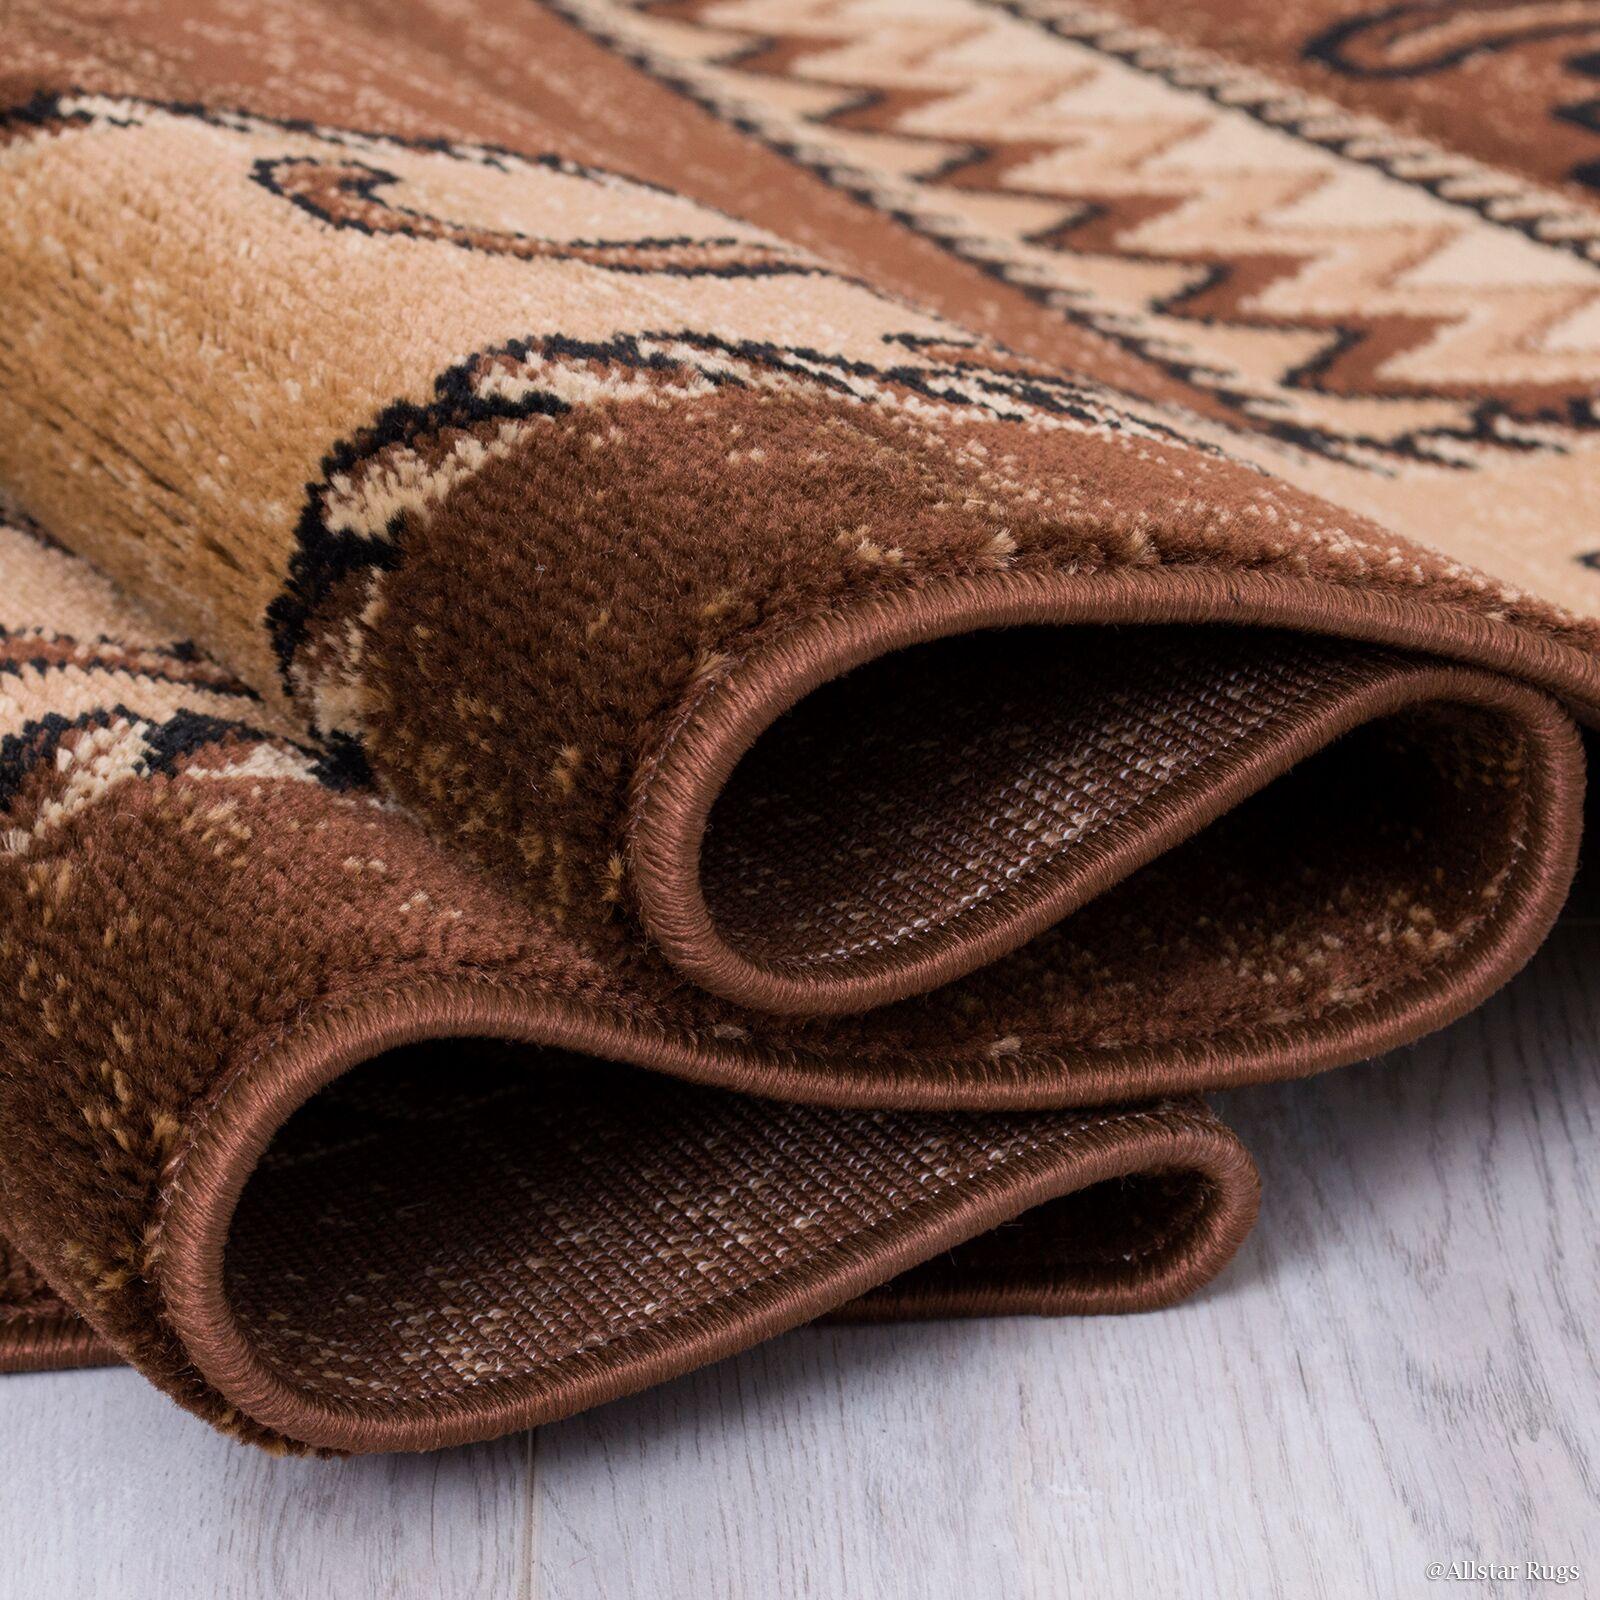 Idris Rectangle Berber Area Rug Rug Size: 3'9